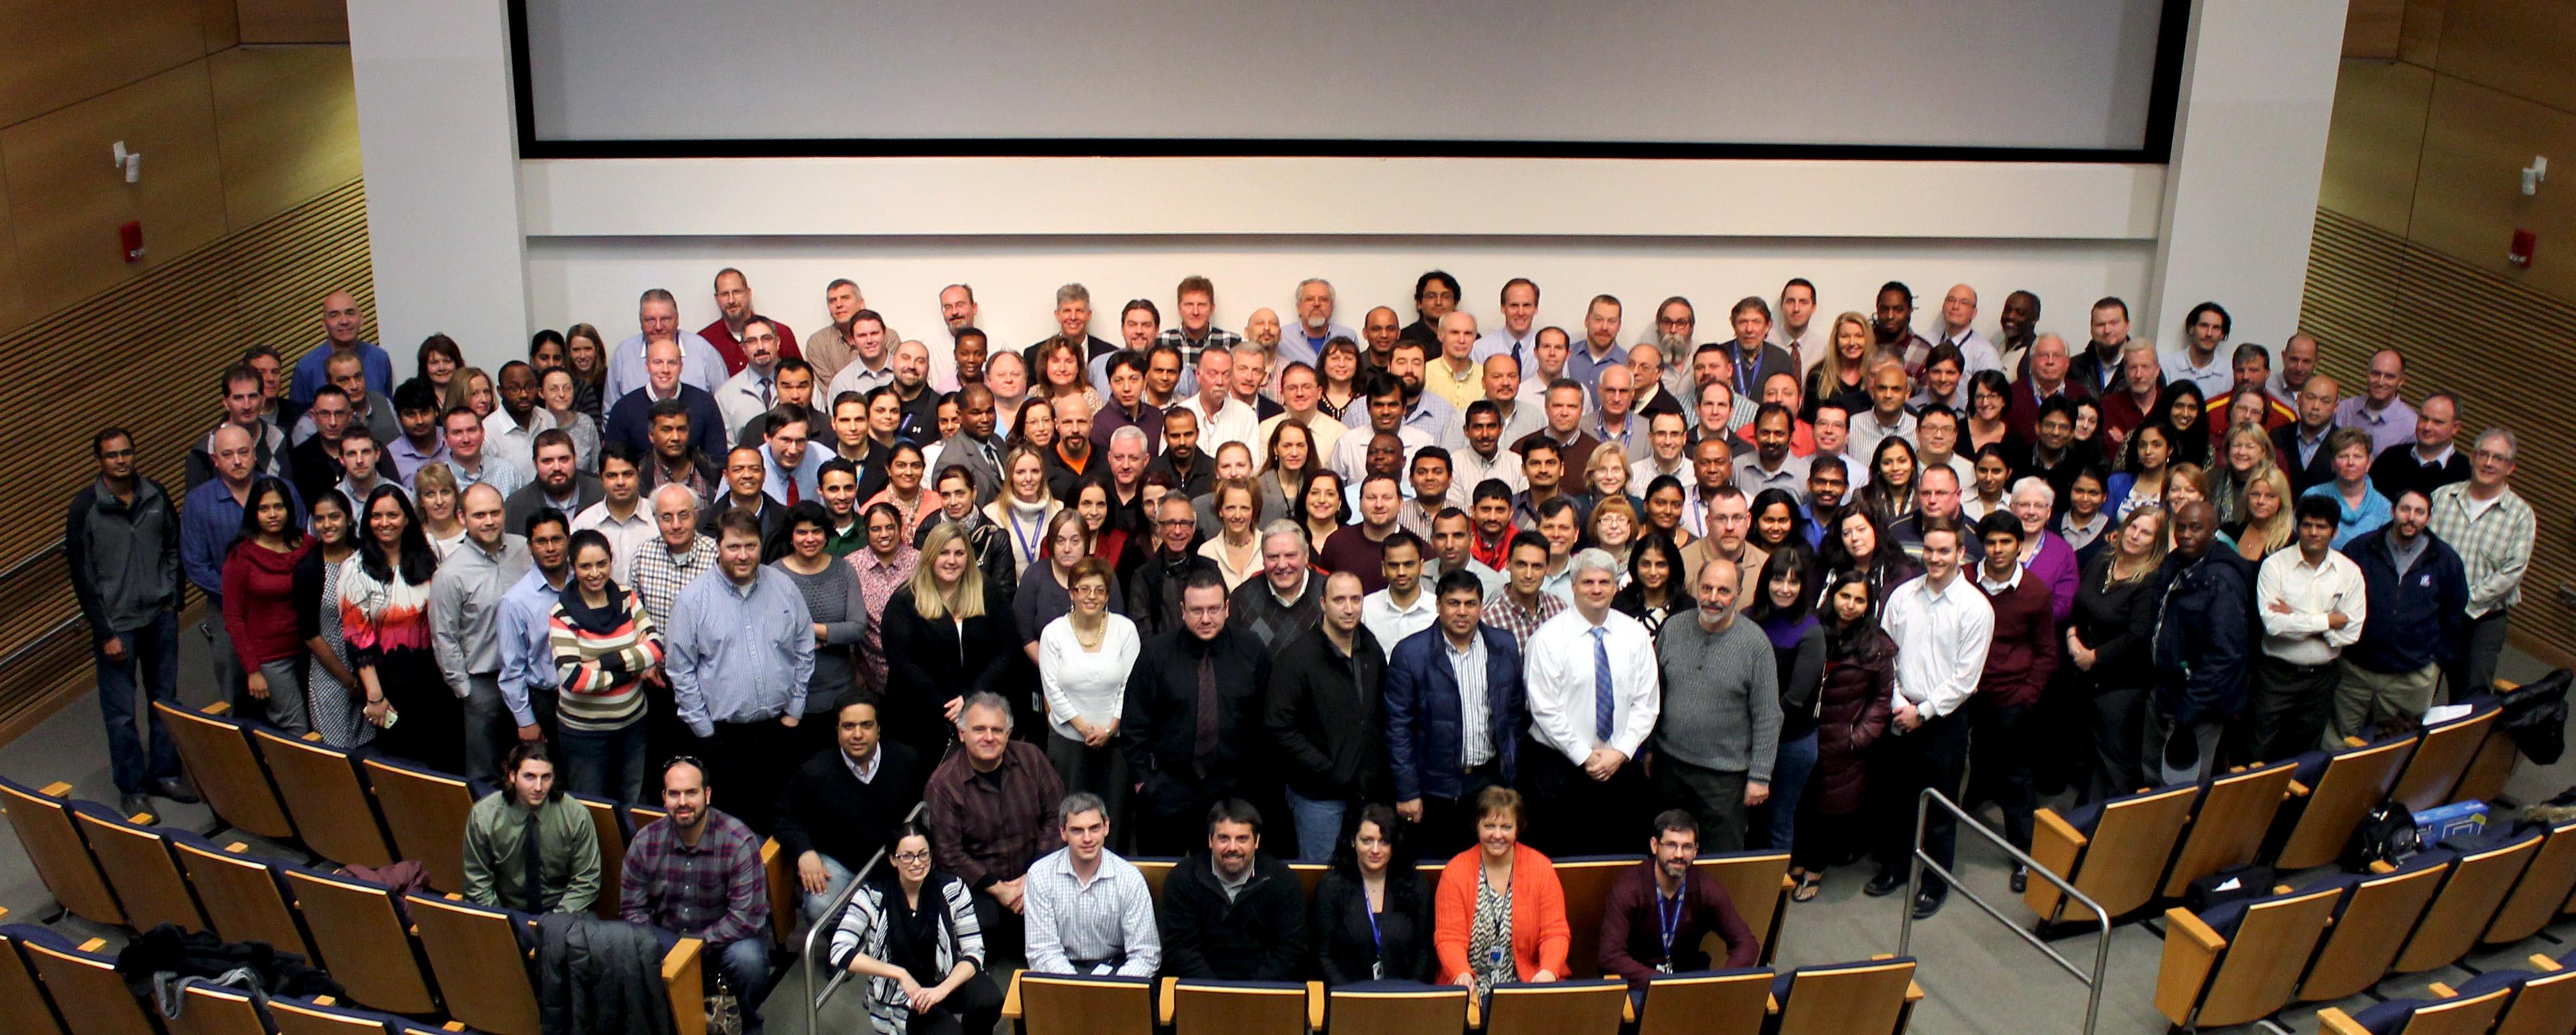 become a supervisor umms it innovation internship mass medical it employee group photo